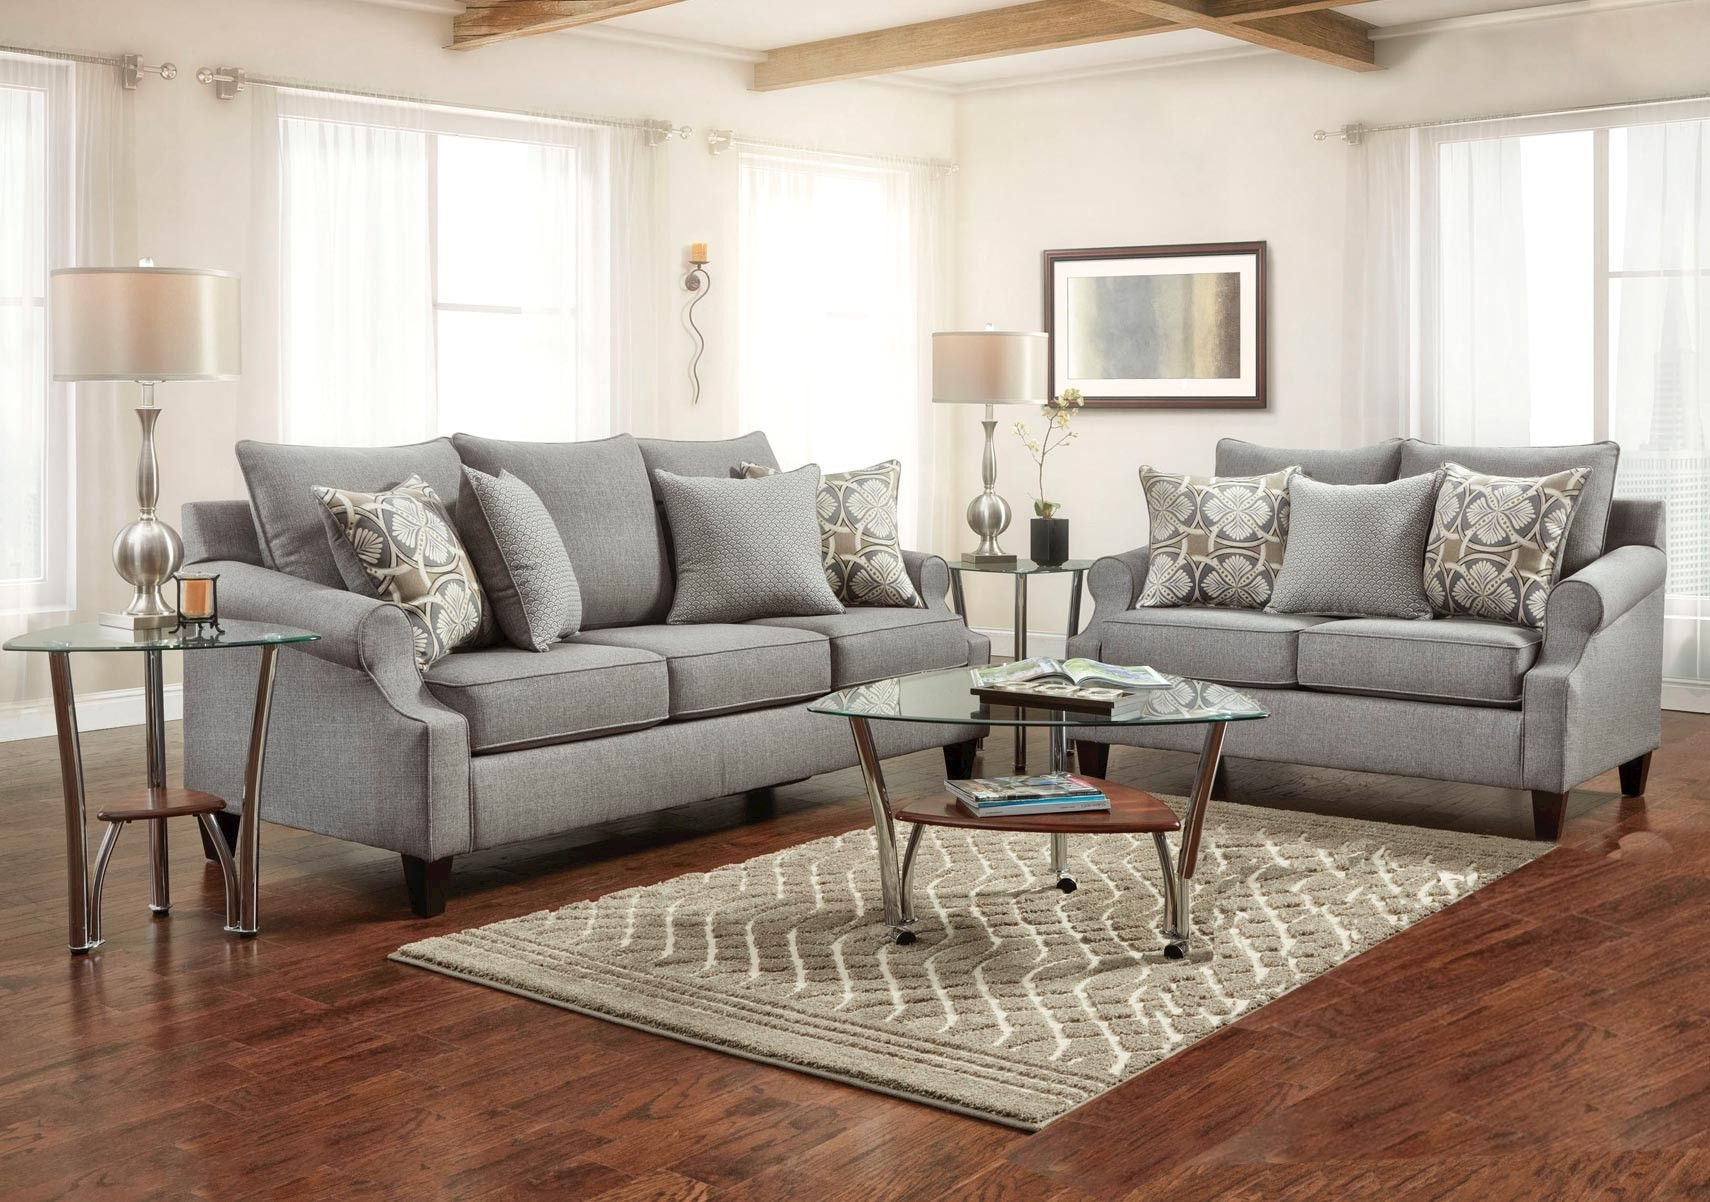 Lacks Harper Gray 2 Pc Living Room Set